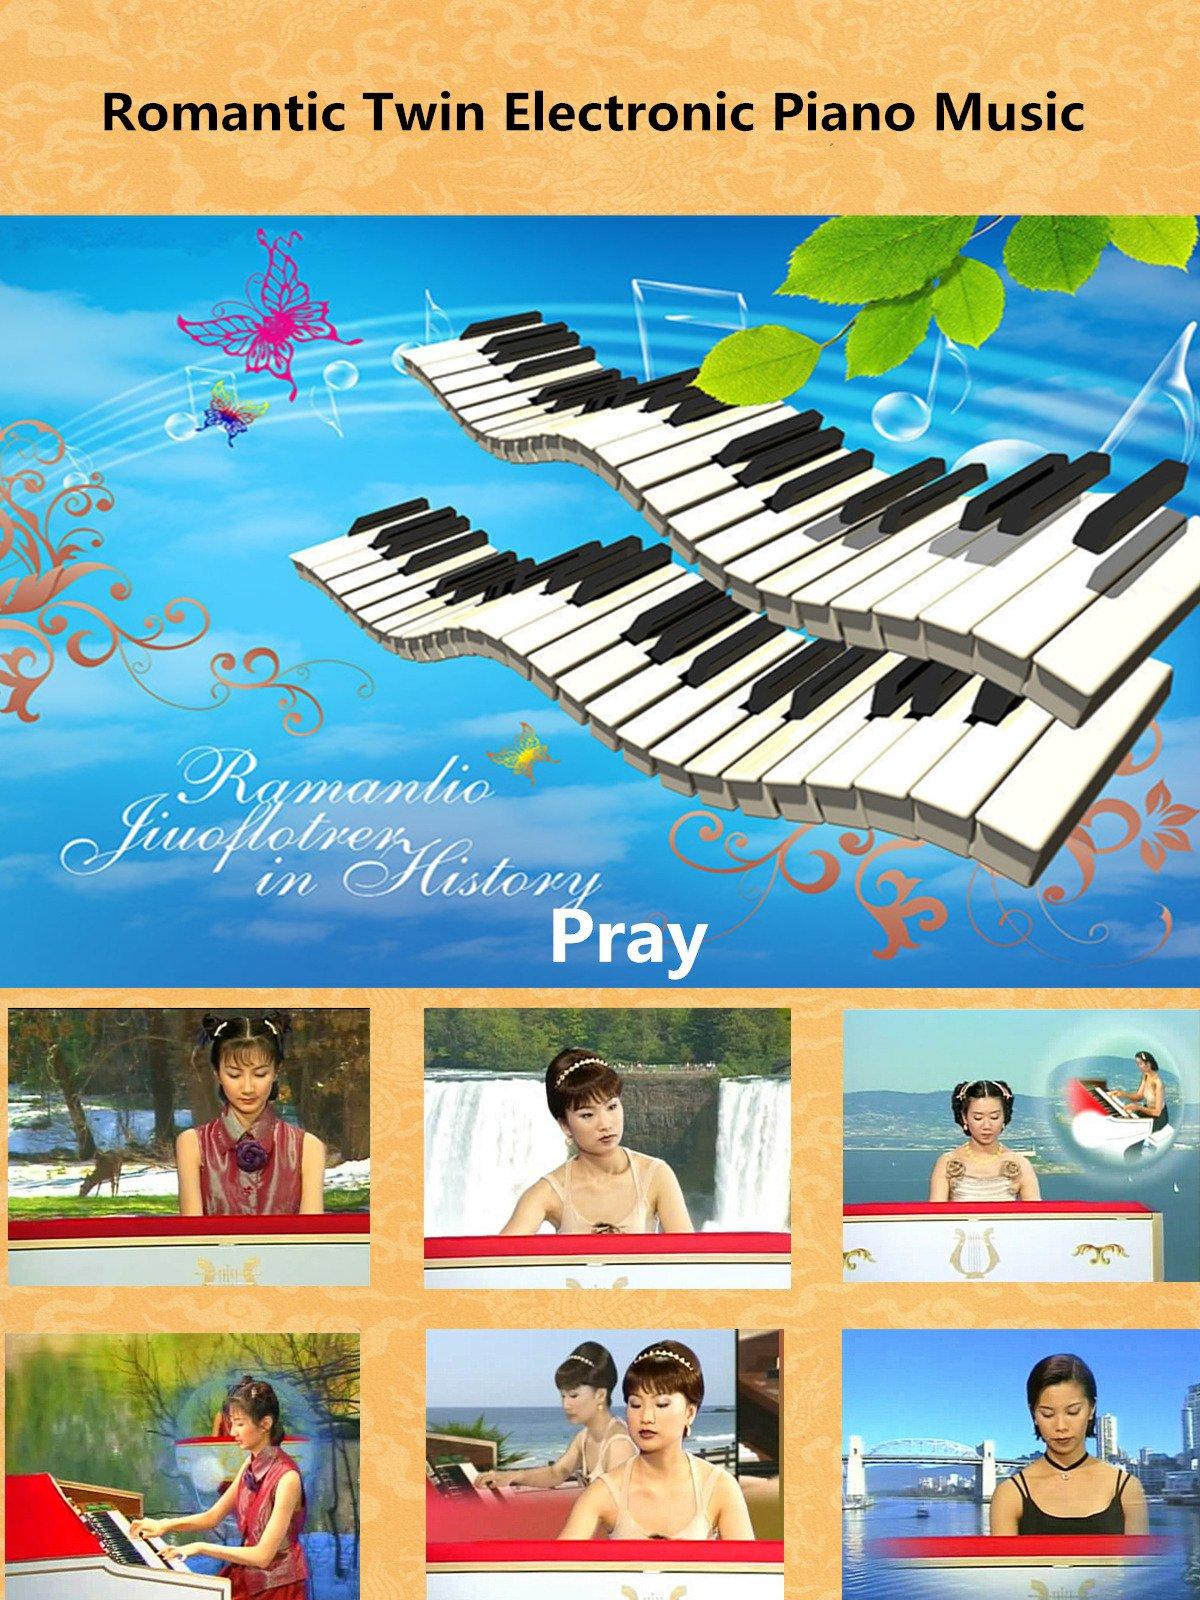 Clip: Pray